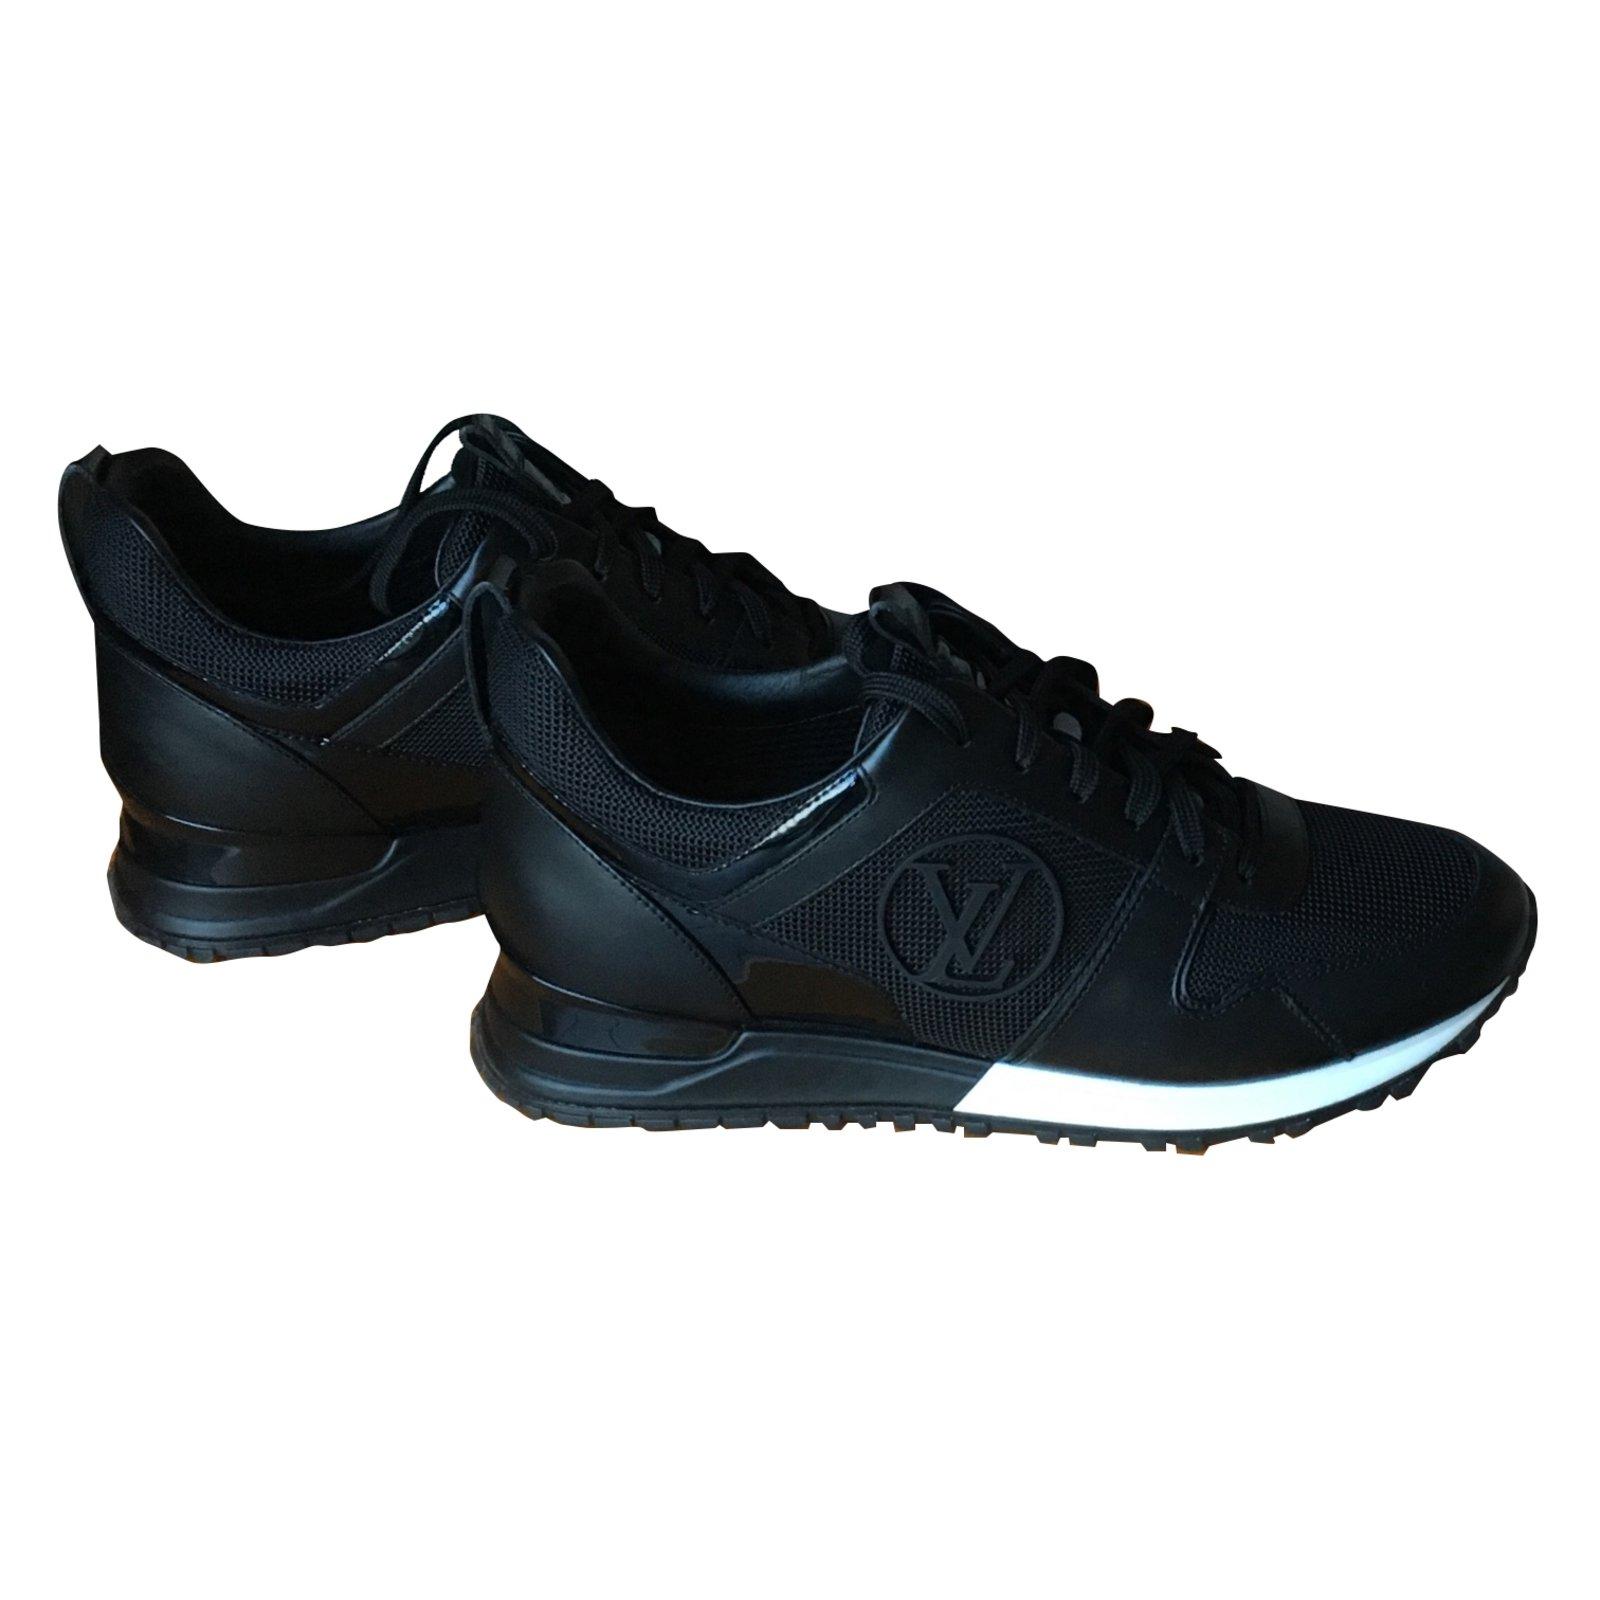 25cf7343aabf Louis Vuitton Sneakers Sneakers Leather Black ref.32340 - Joli Closet